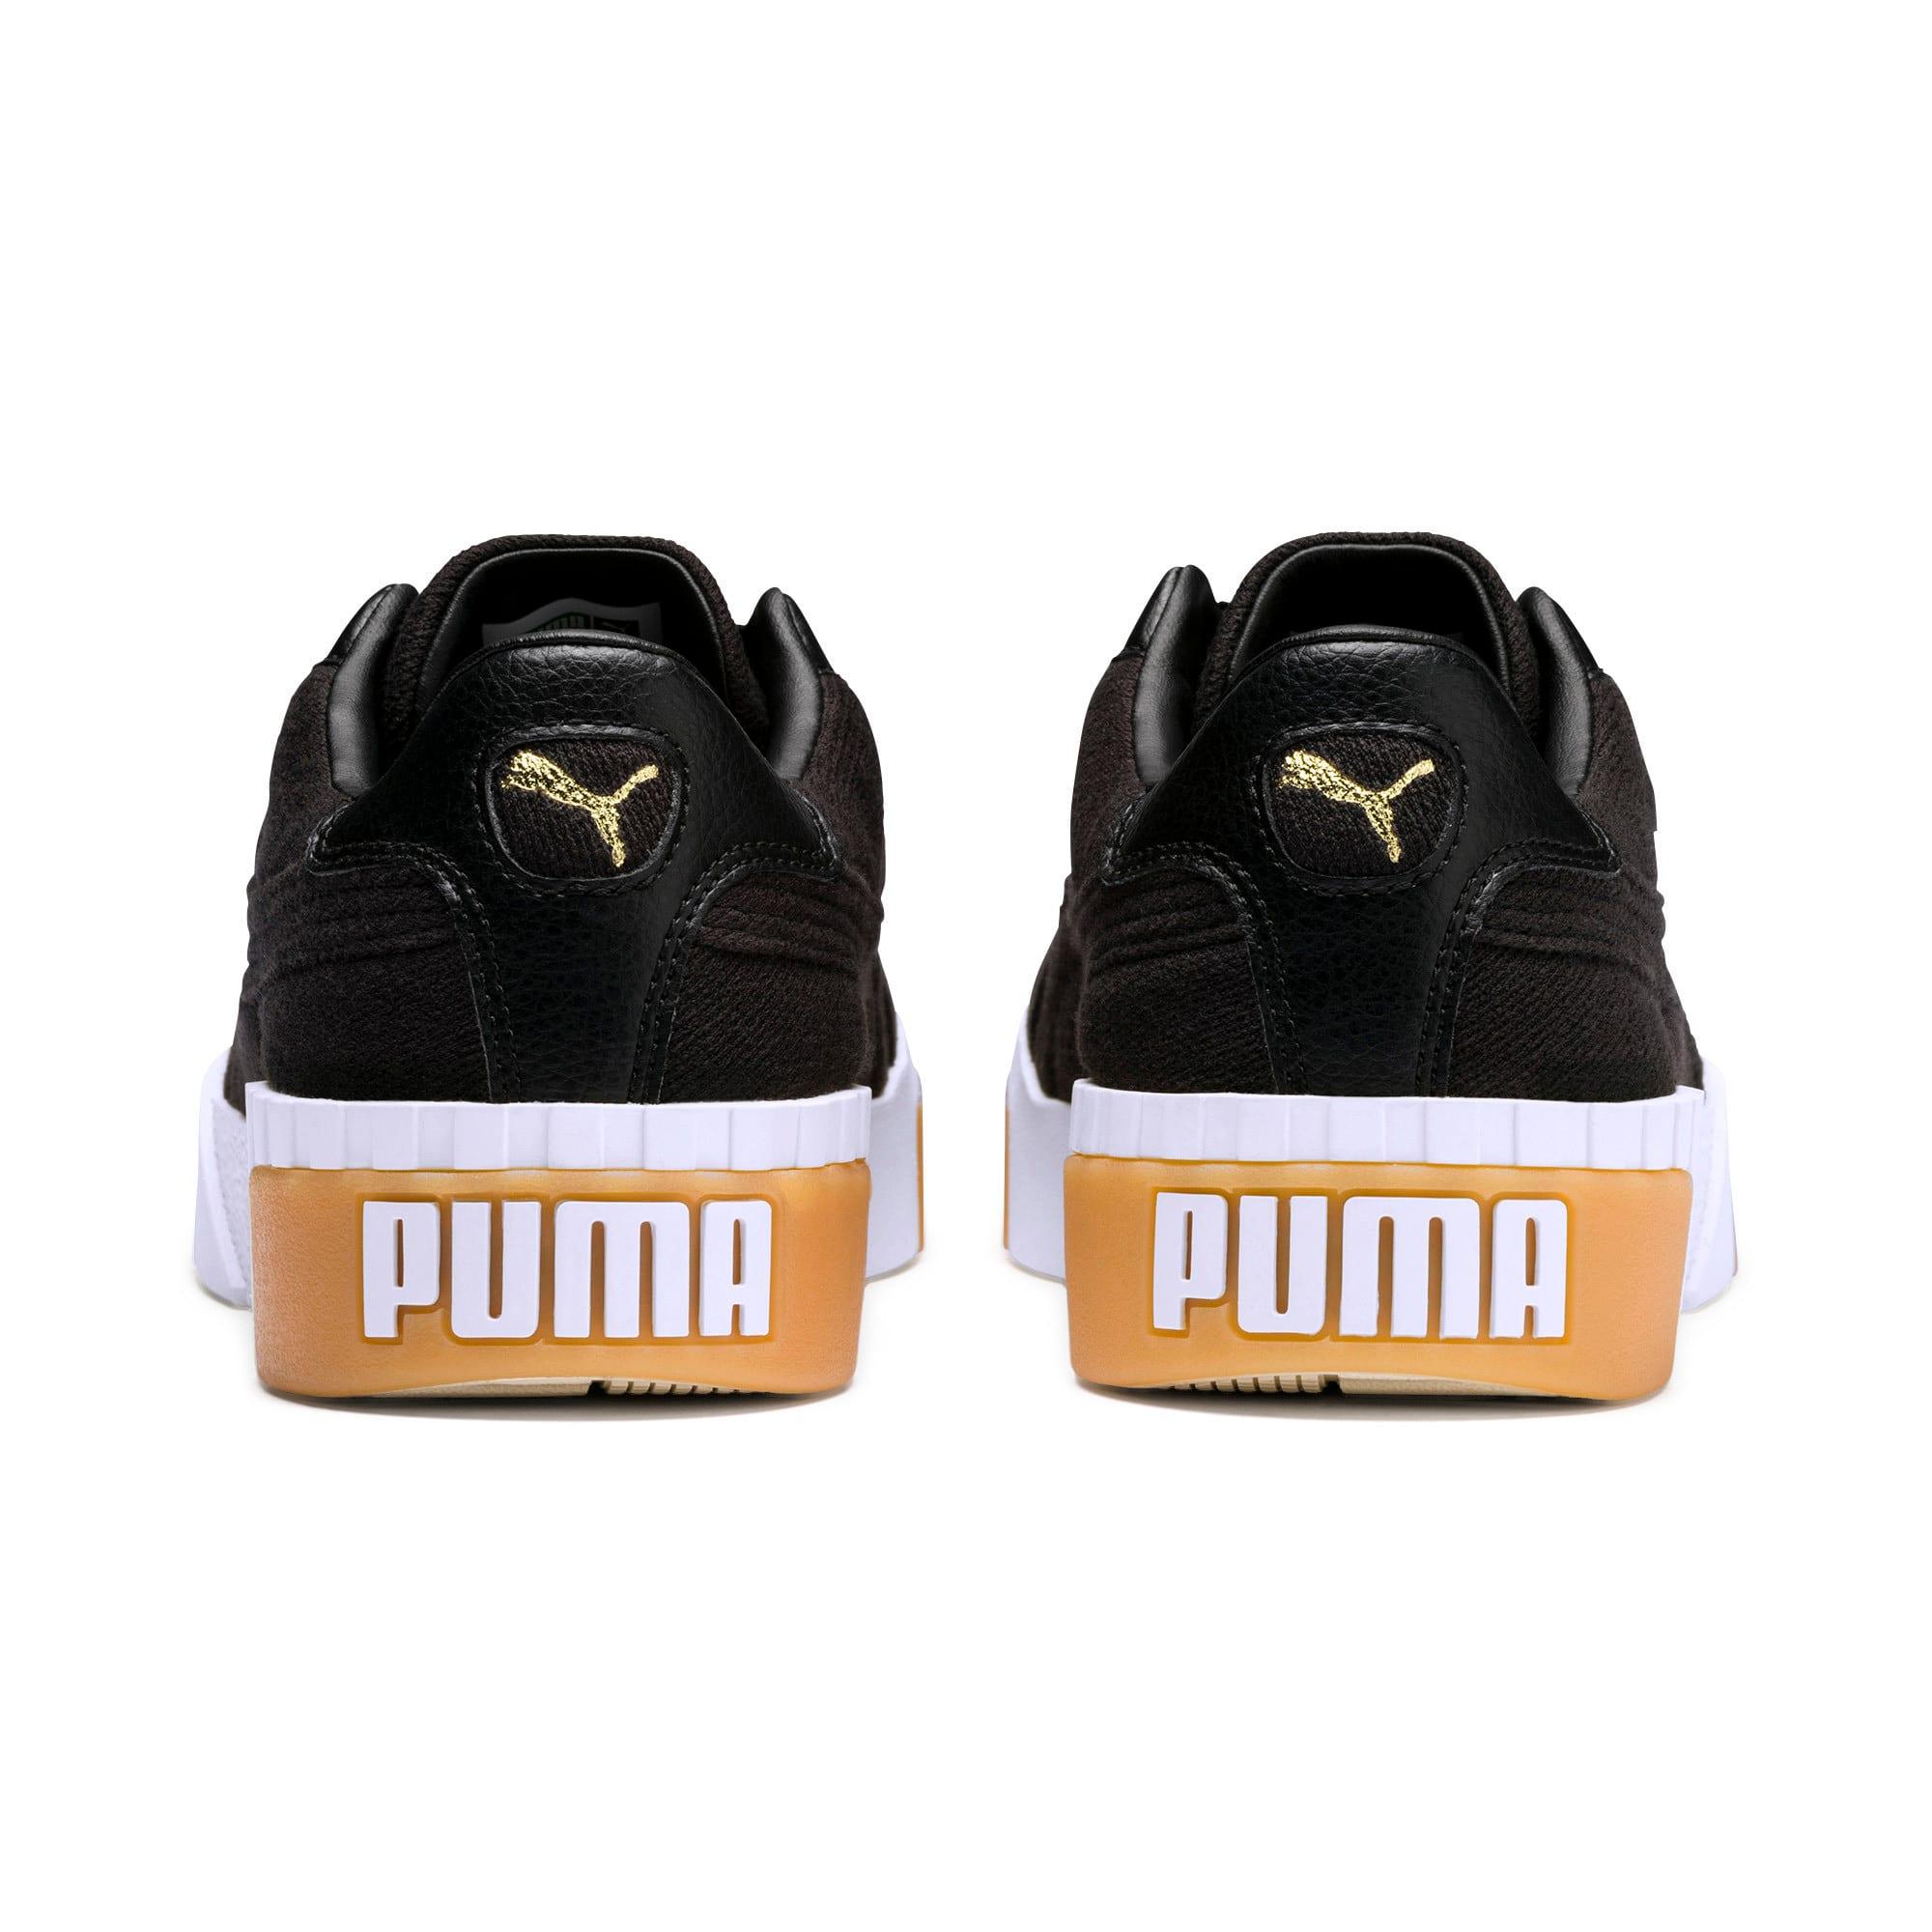 Thumbnail 3 of Cali Exotic Women's Trainers, Puma Black-Puma Black, medium